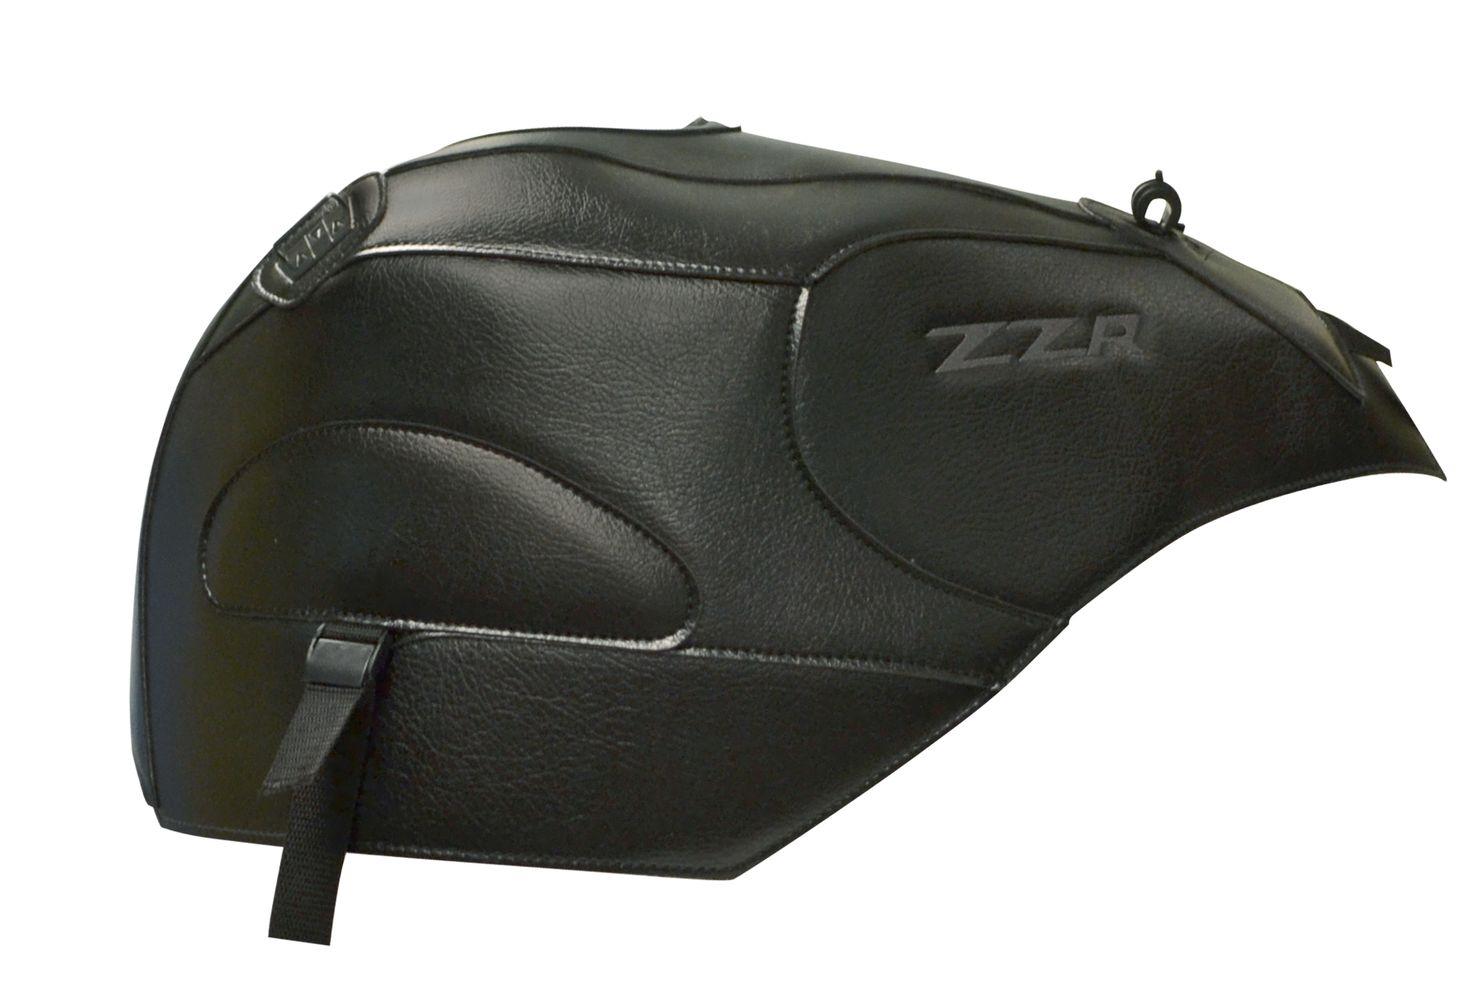 Protège-réservoir Bagster Kawasaki ZZR 1400 12-15 noir